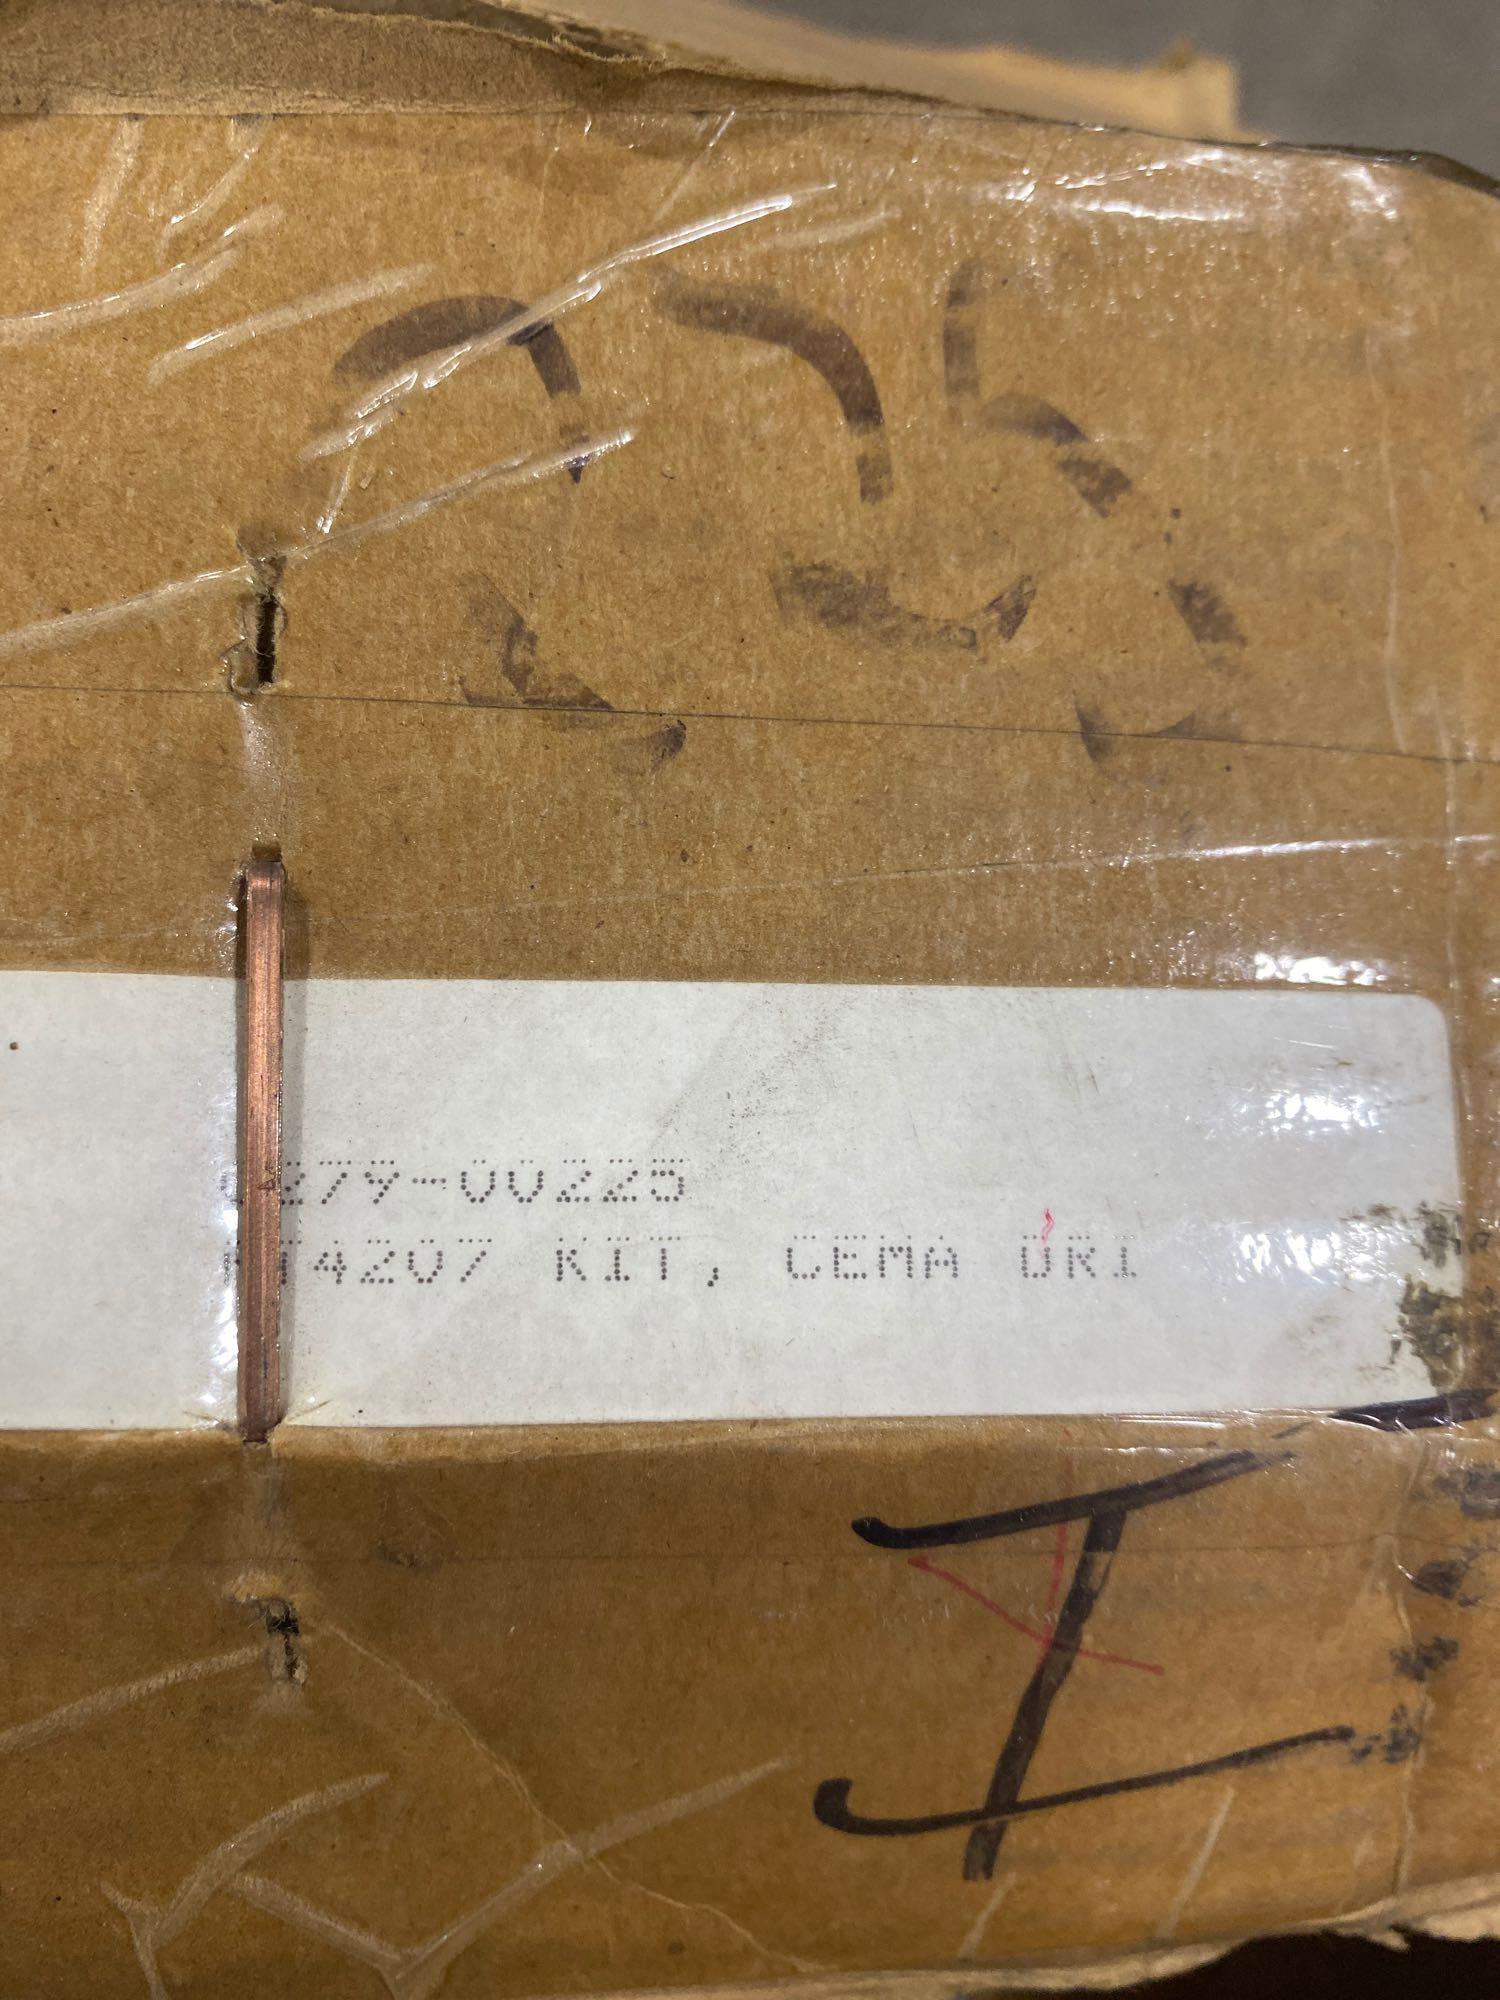 Lot 13 - Hub City model 0279-00225 shaft kit. New in box.